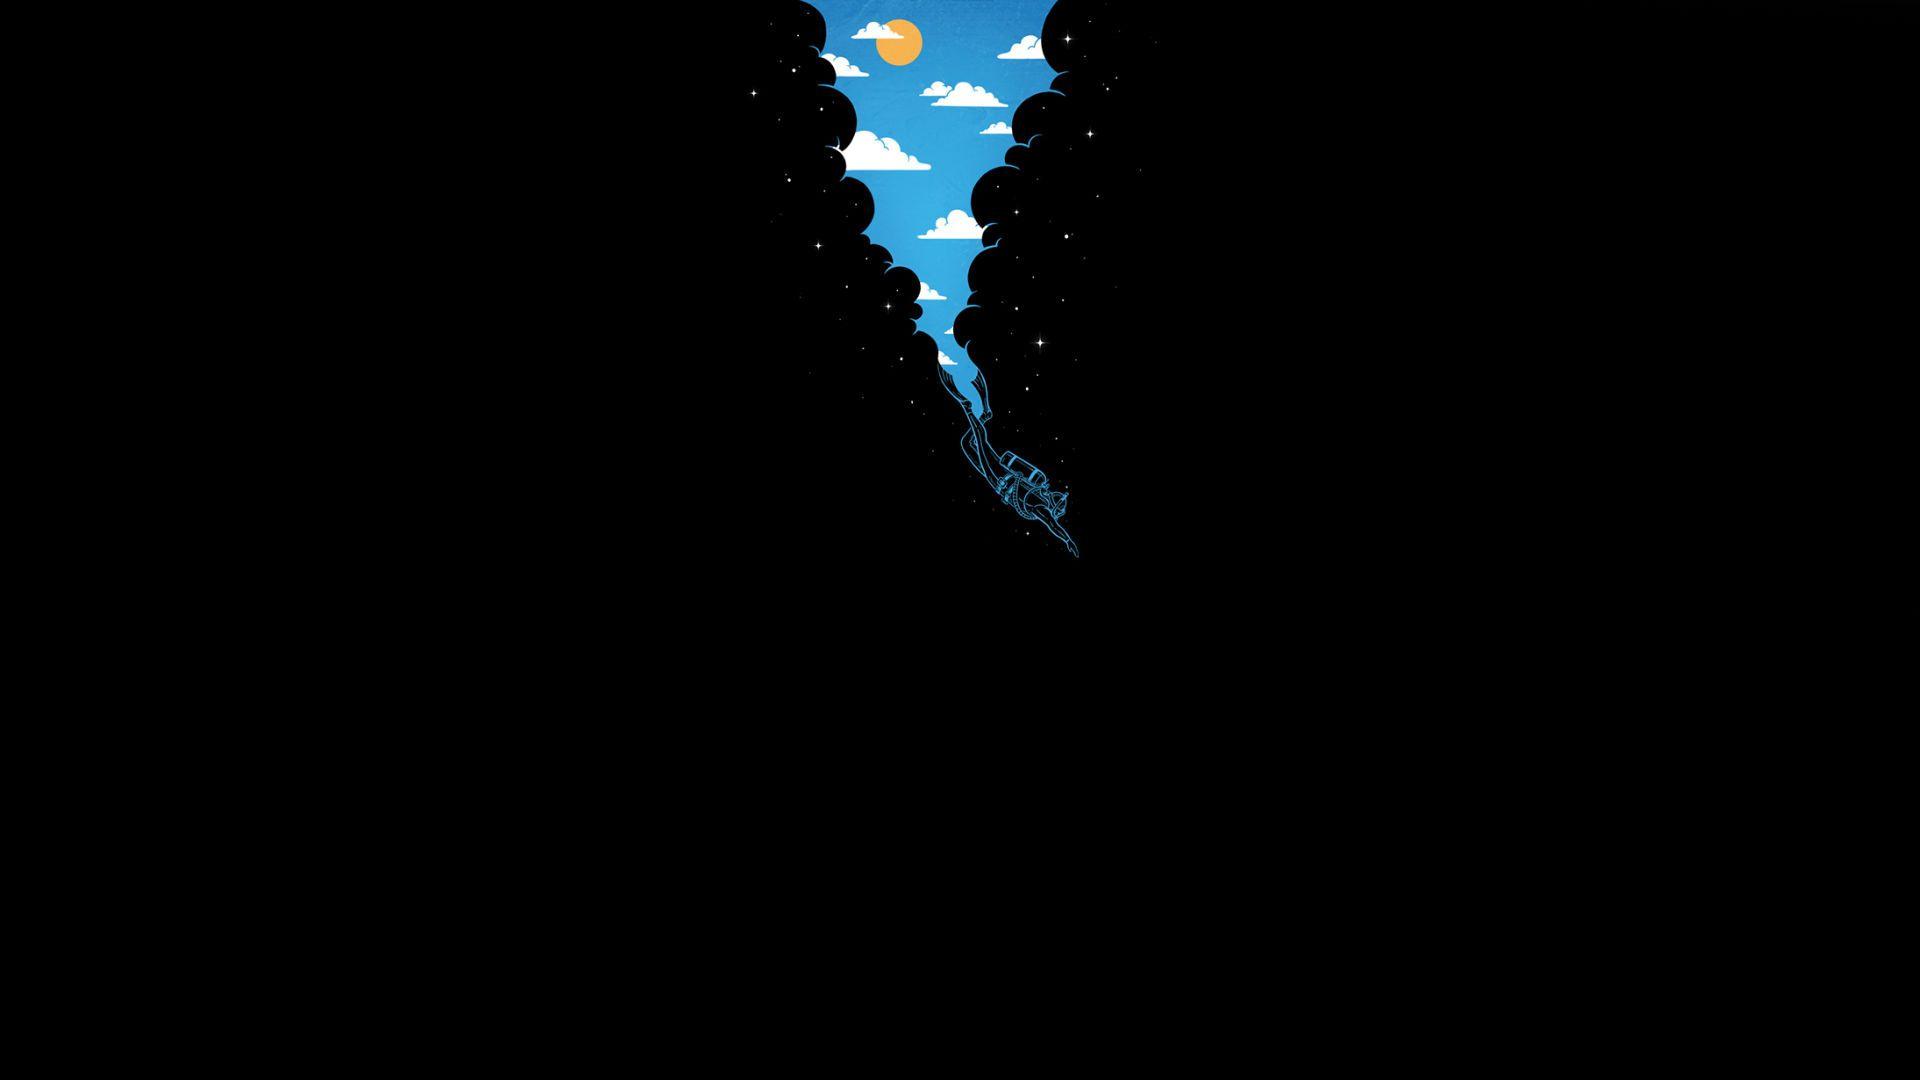 Wallpaper steine herz  Sky, sun, clouds, darkness, star diver depth, clearance | Baldr ...